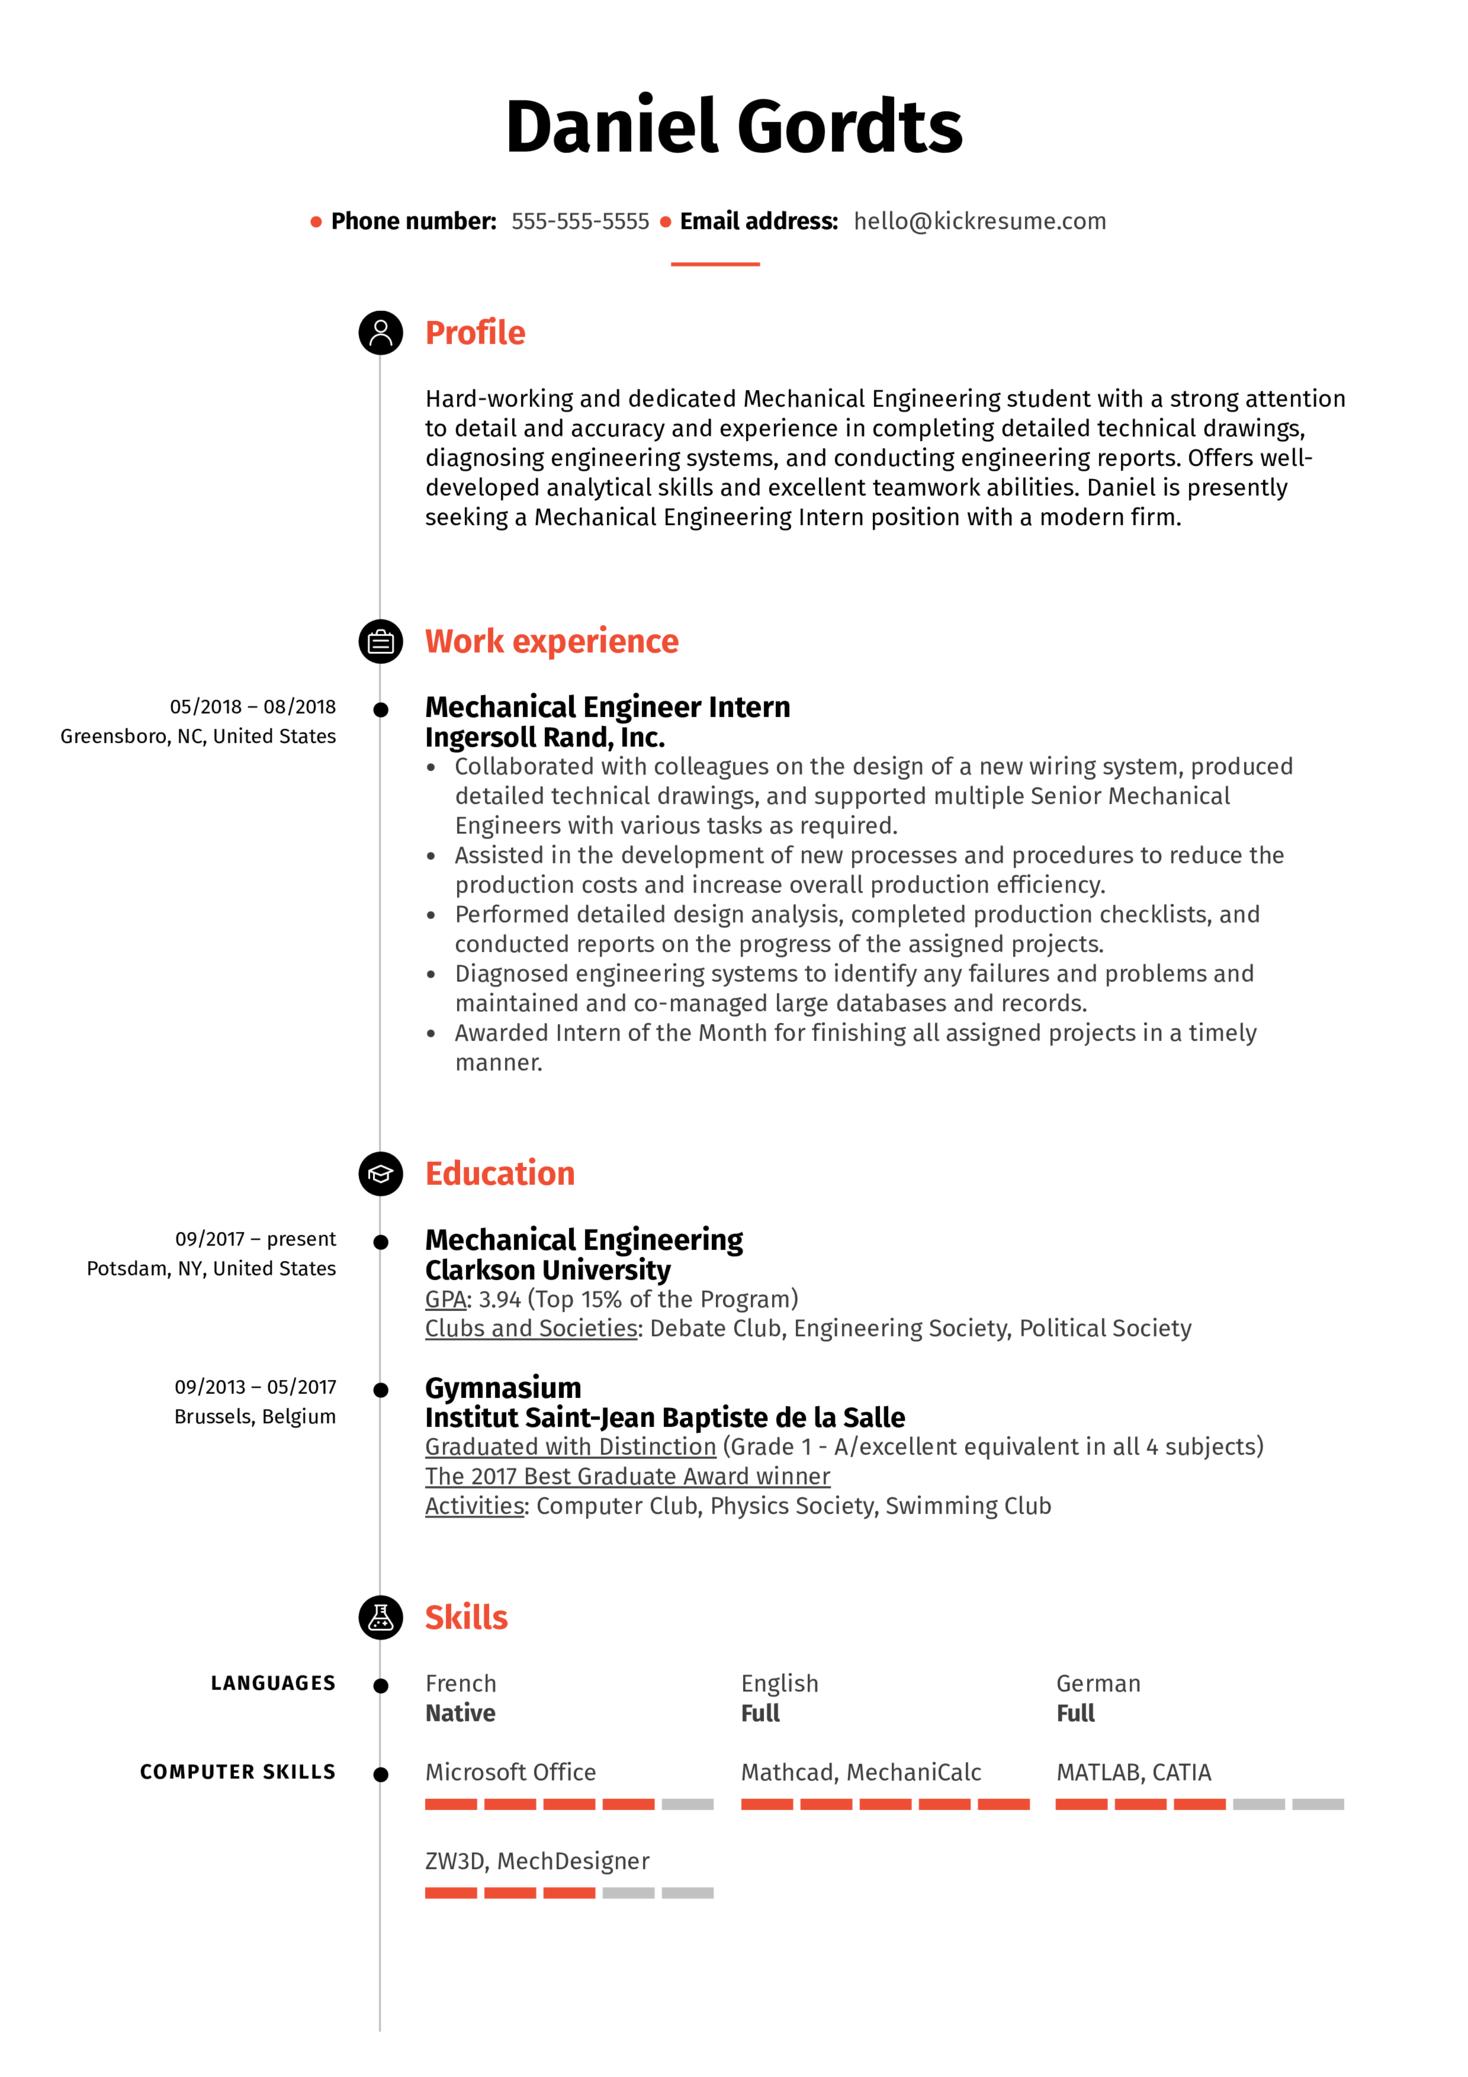 Mechanical Engineering Intern Resume Example (parte 1)